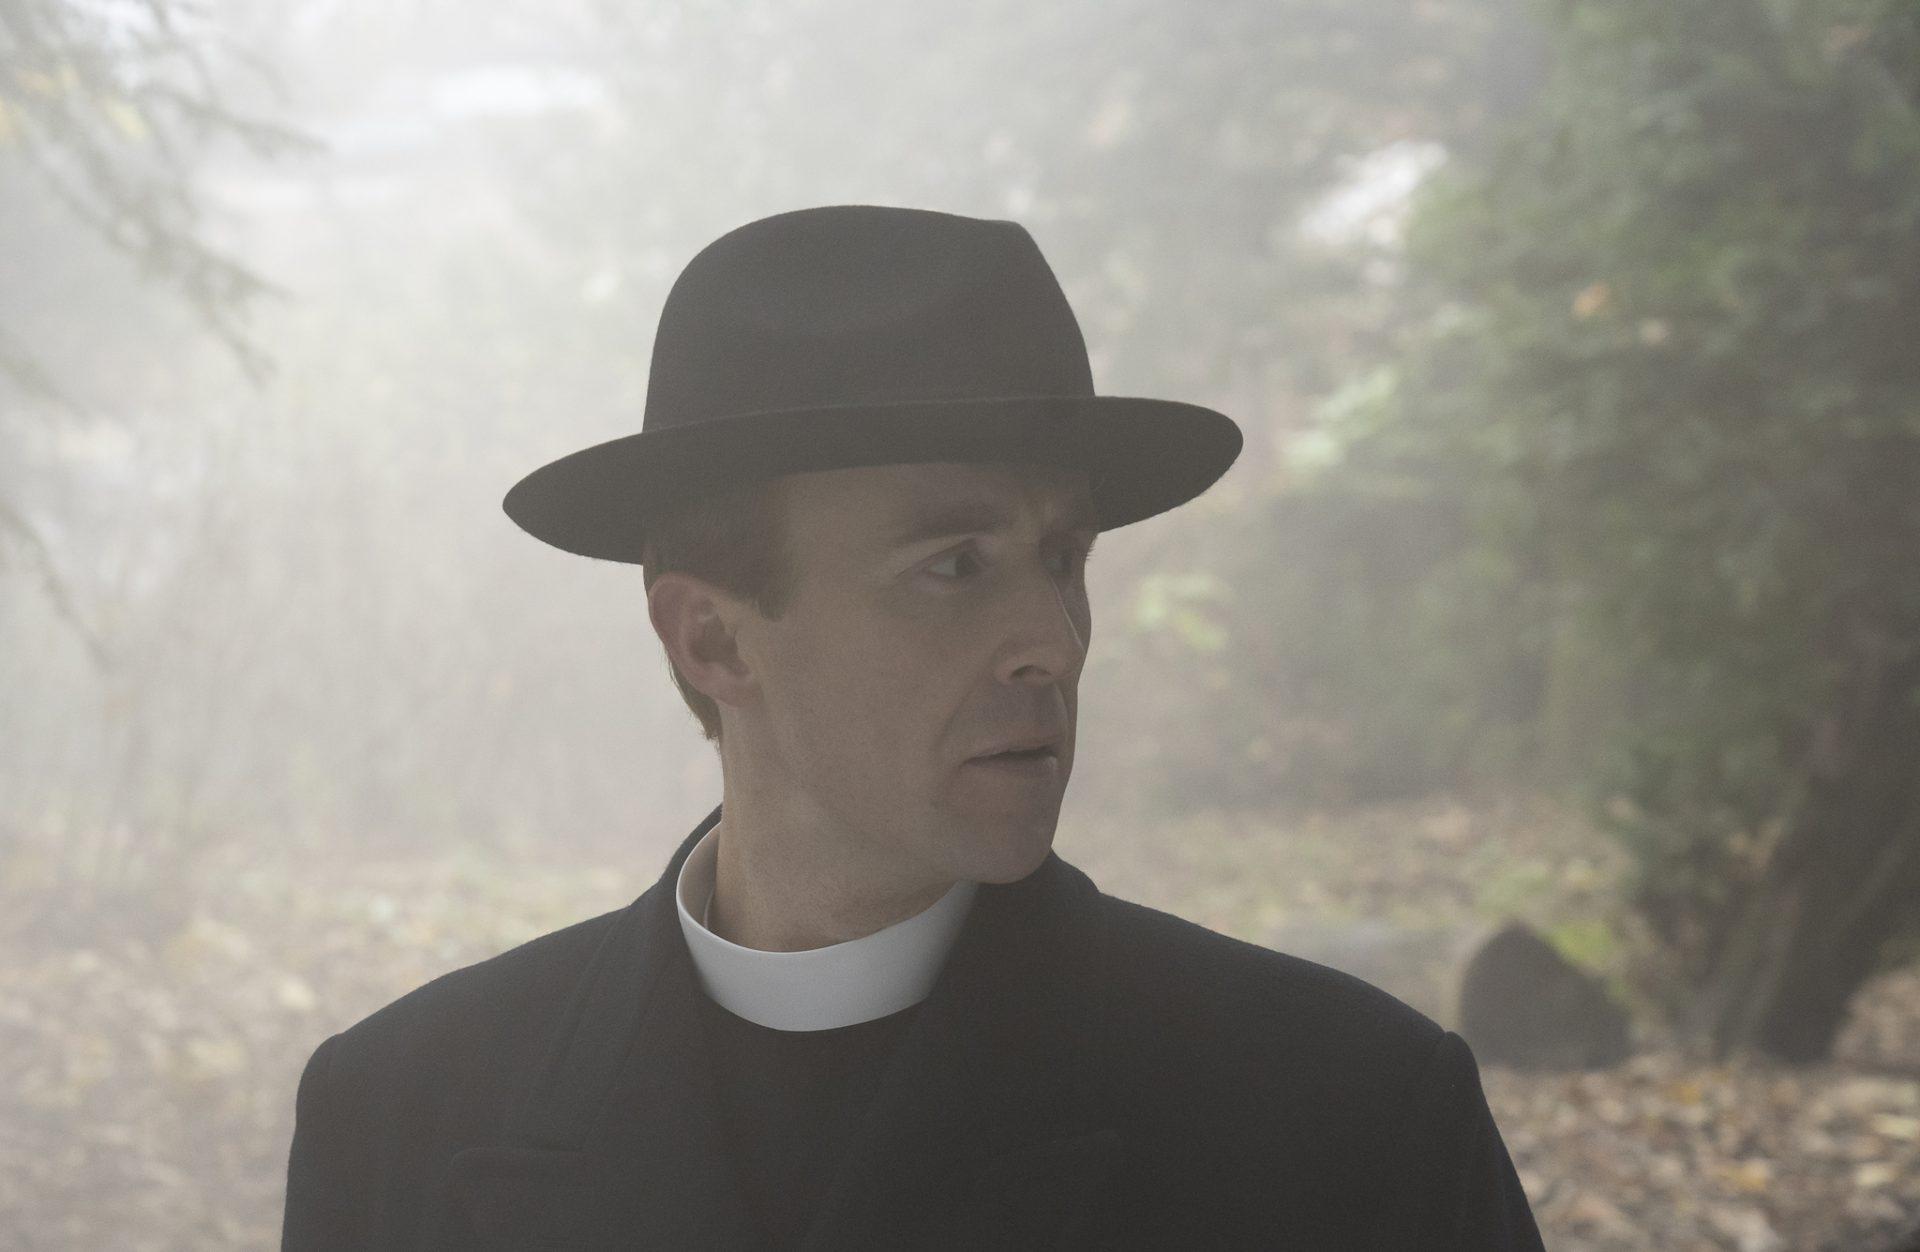 Shudder to release British supernatural horror film The Banishing –